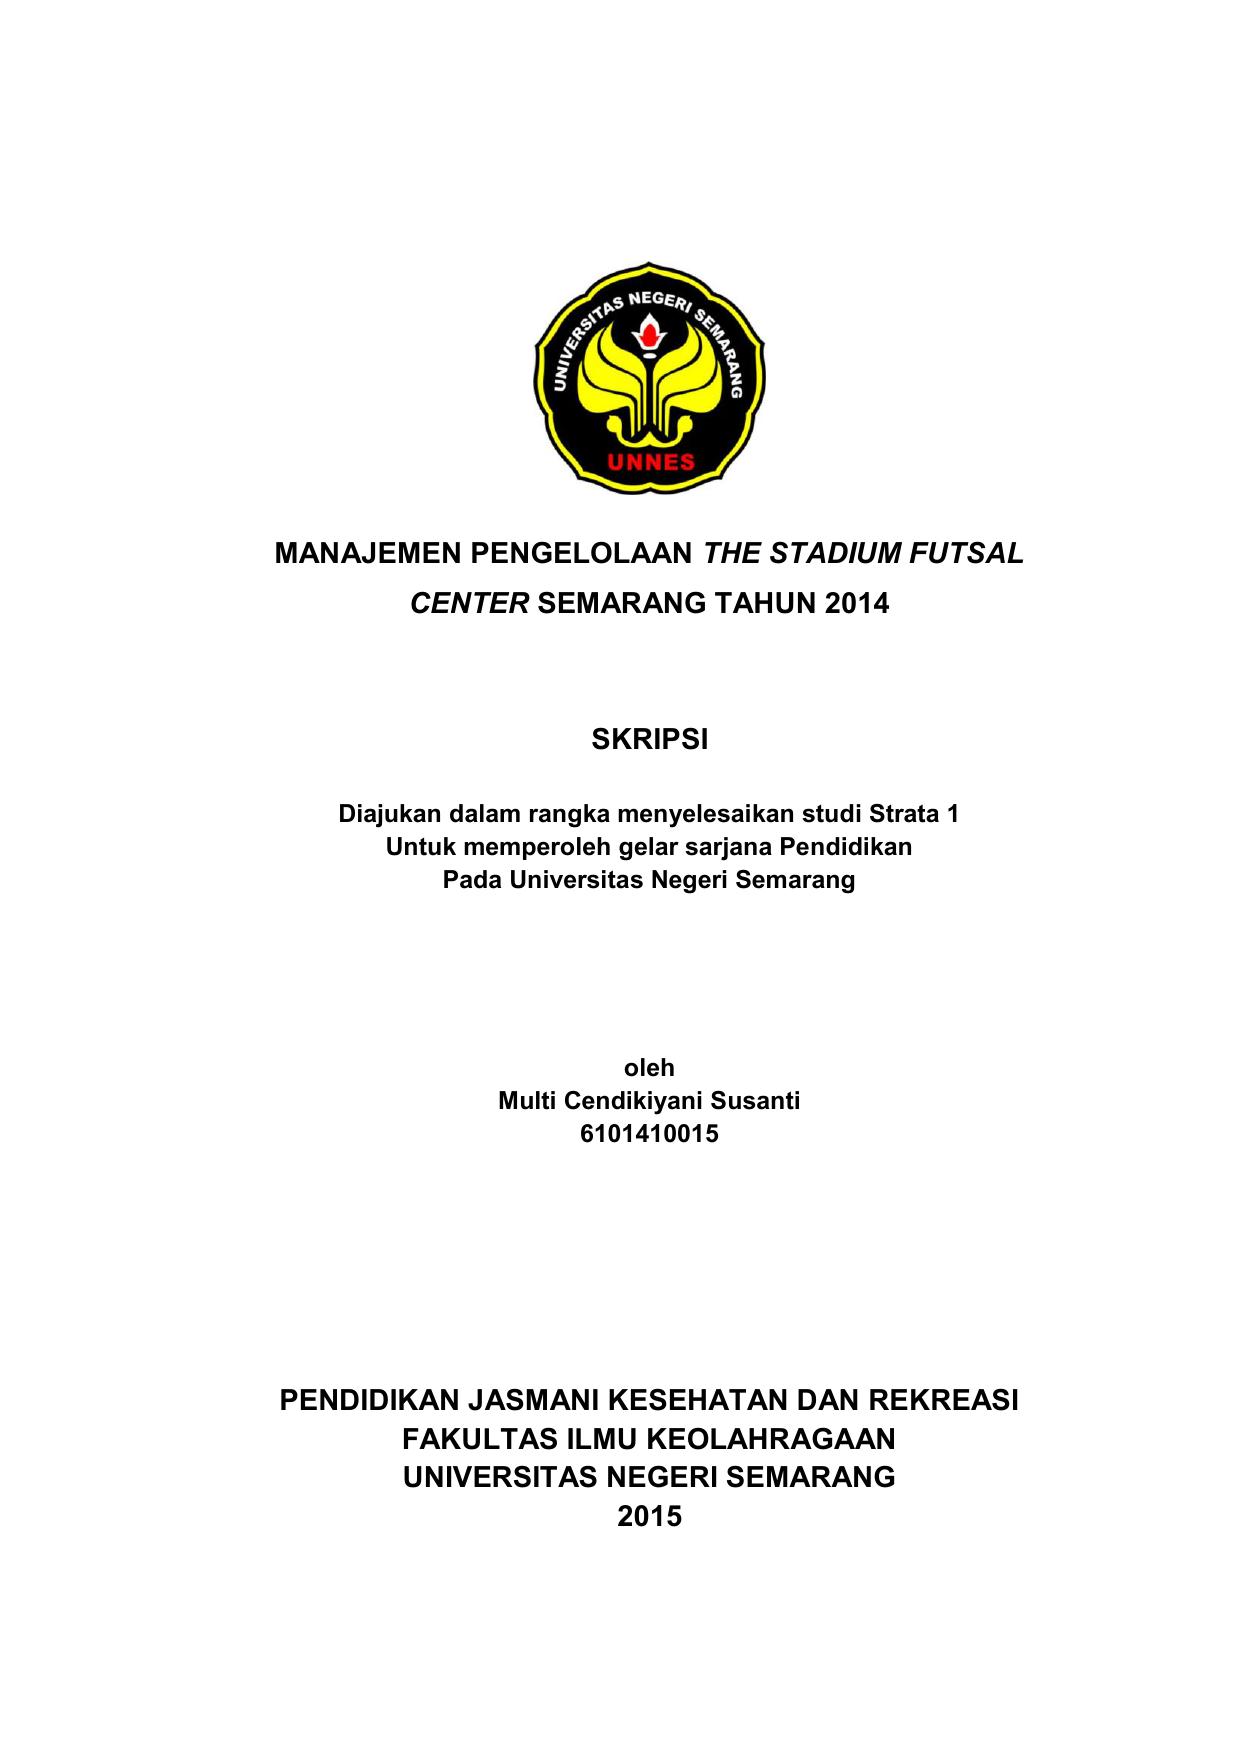 Skripsi Olahraga Futsal Ide Judul Skripsi Universitas